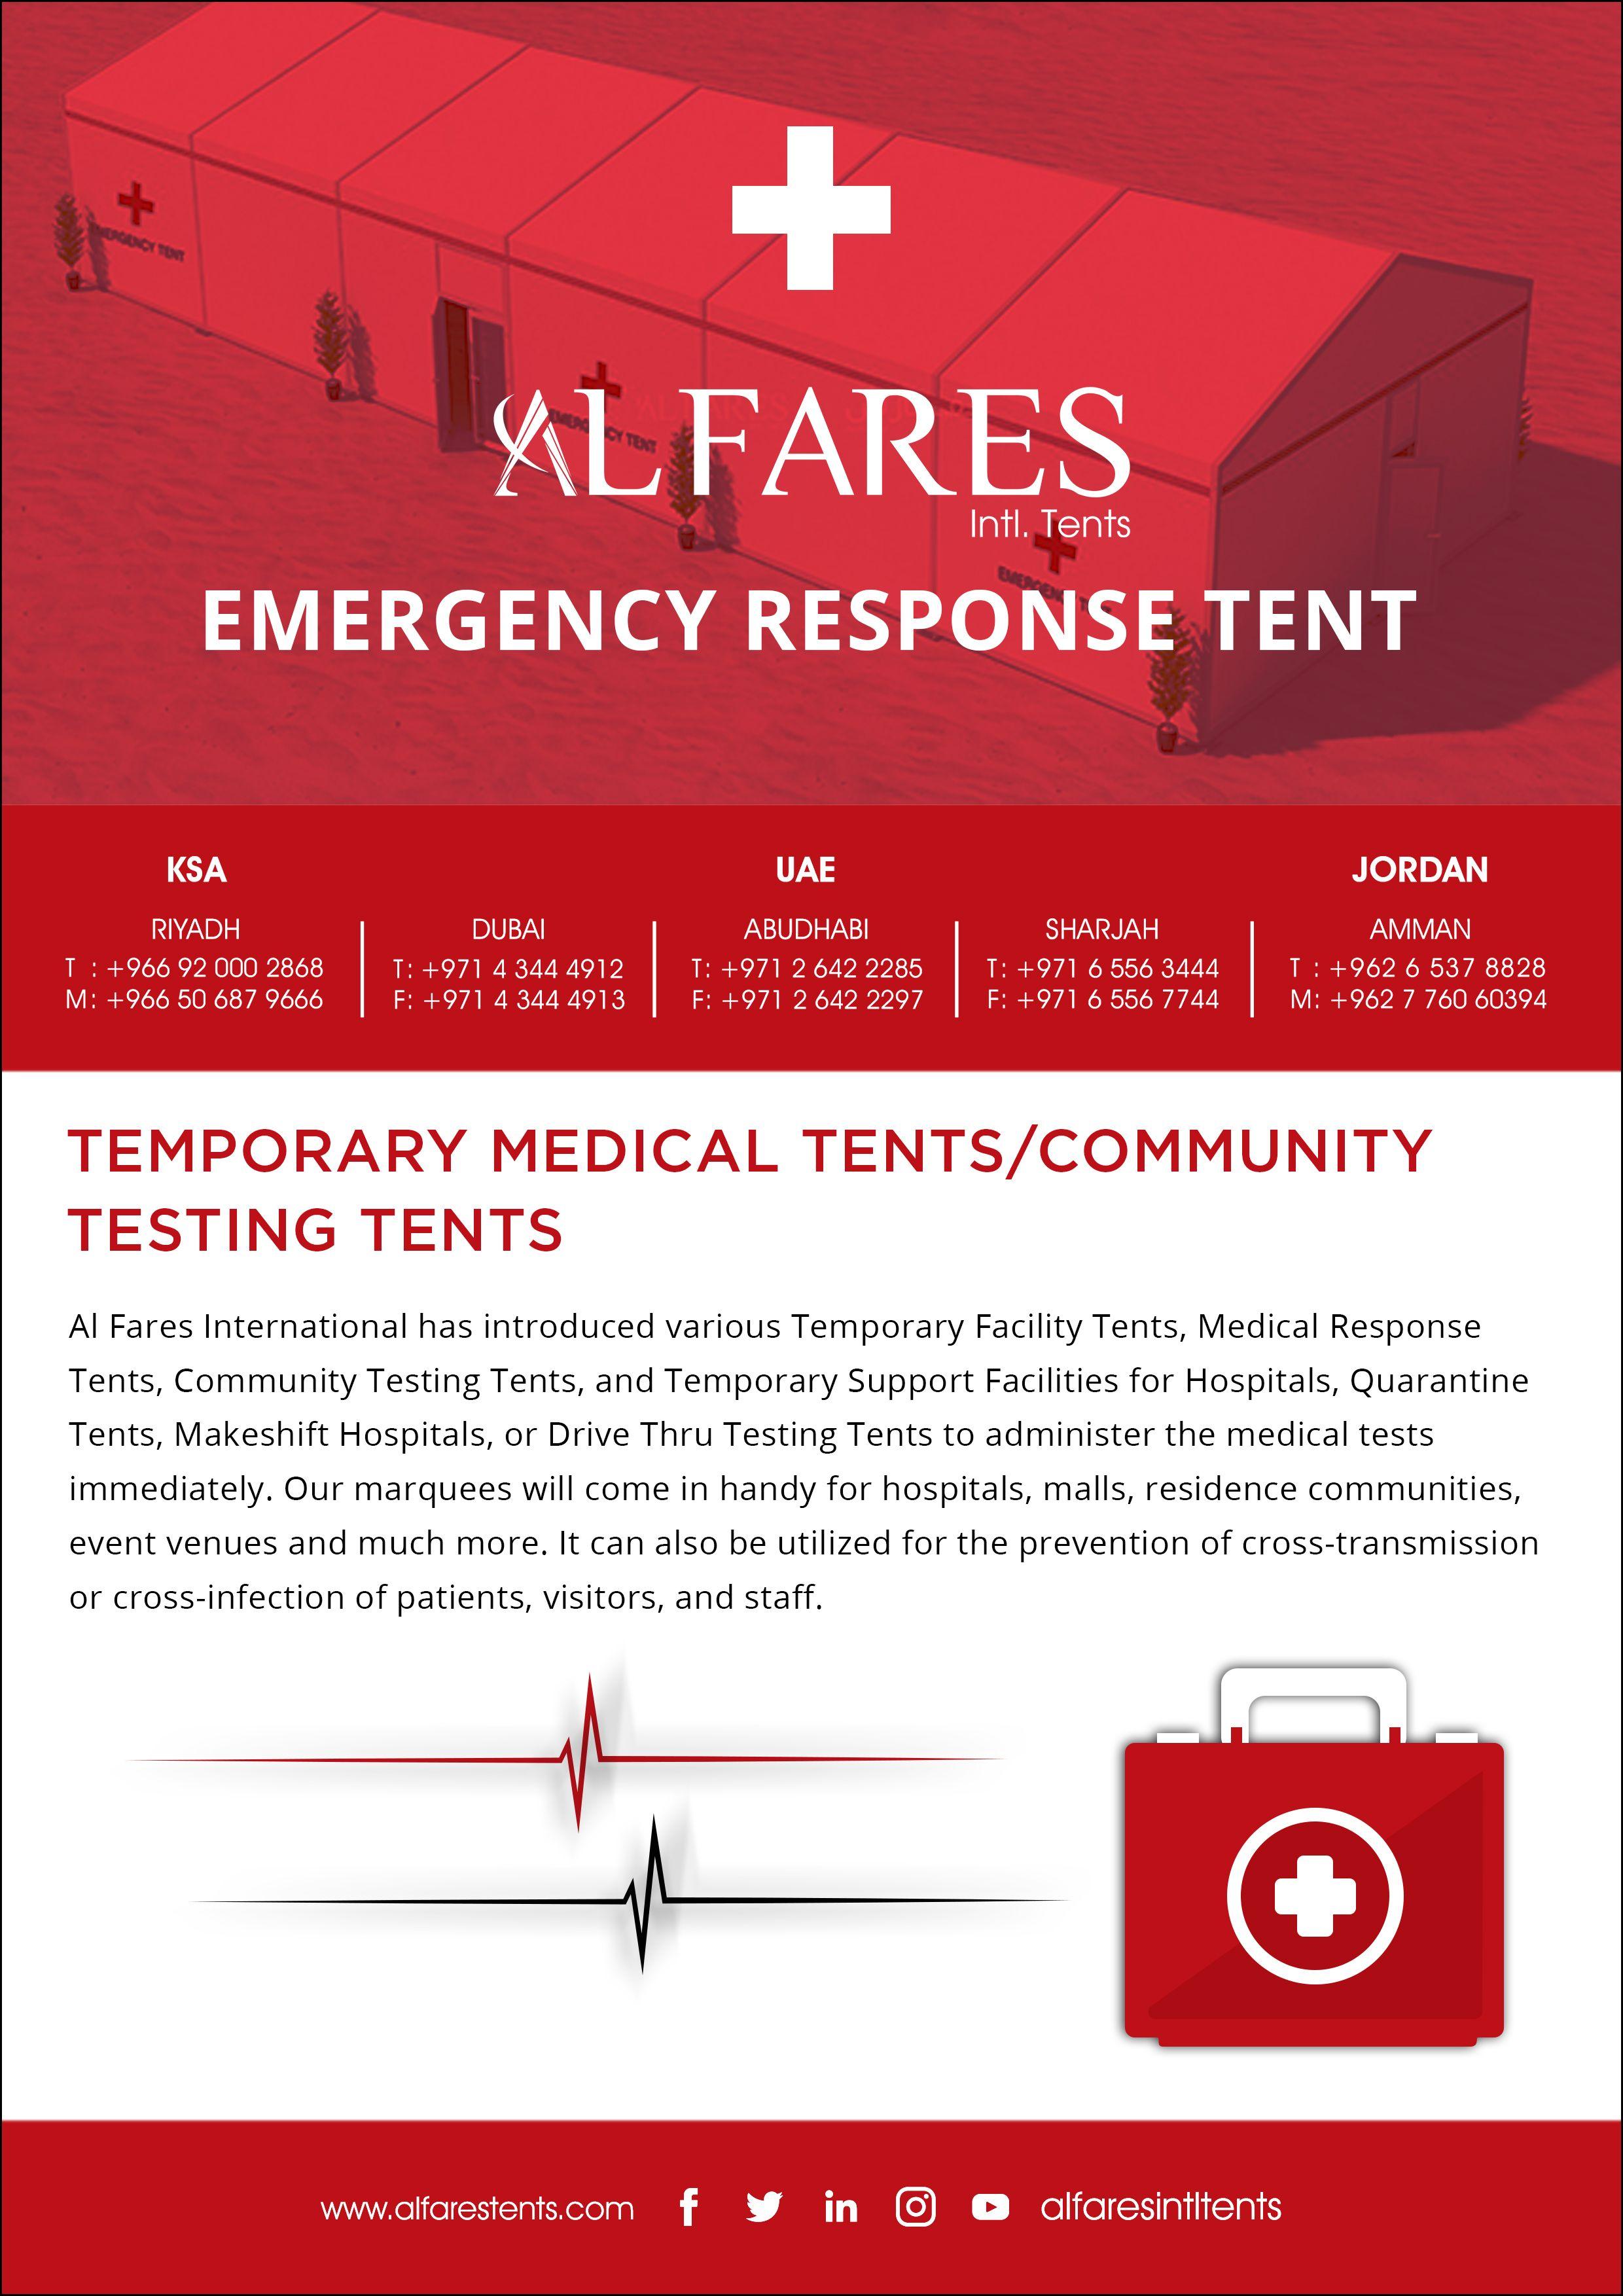 Temporary Medical Tents Makeshift Hospitals Uae Saudi Arabia In 2020 Medical Tests Tent Event Tent